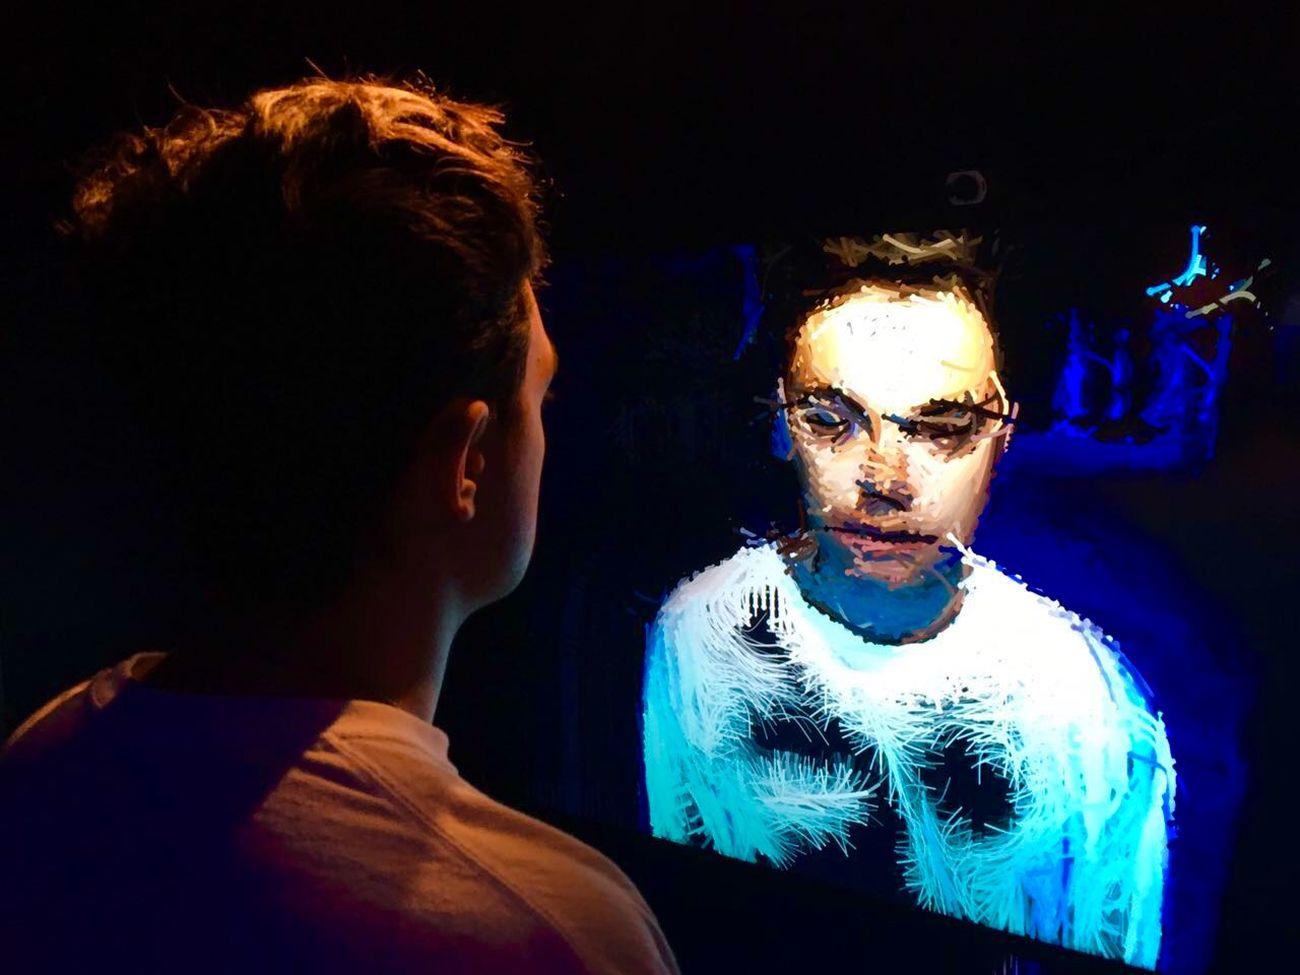 Album Art ArtWork Coverart Digits Karakter Music Young Men